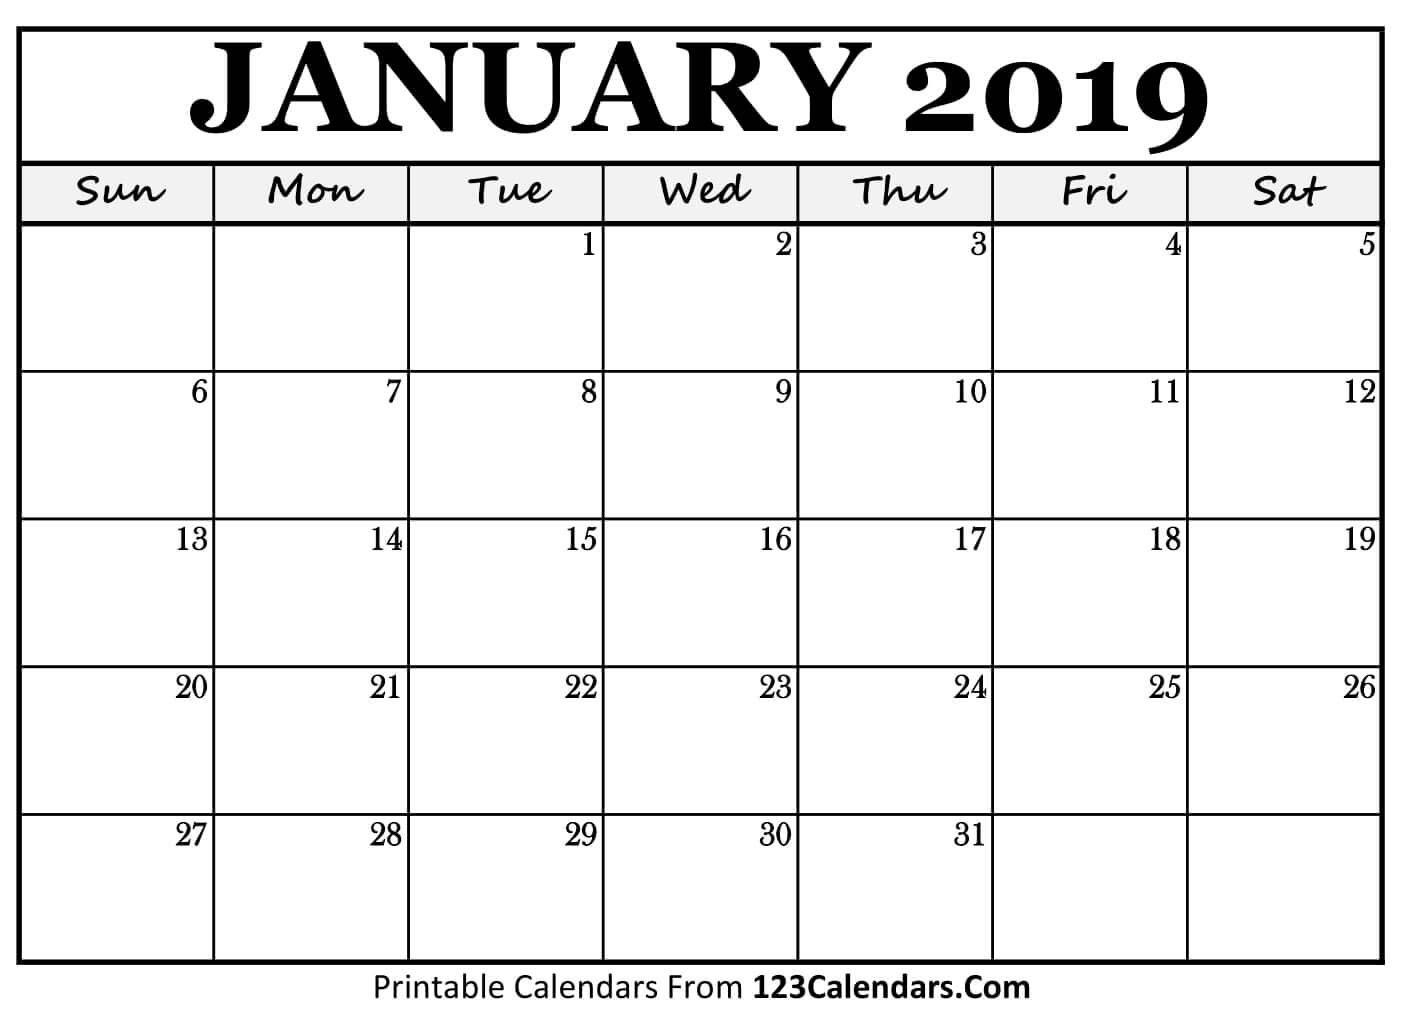 2019 Printable Calendar – 123Calendars 2019 Calendars